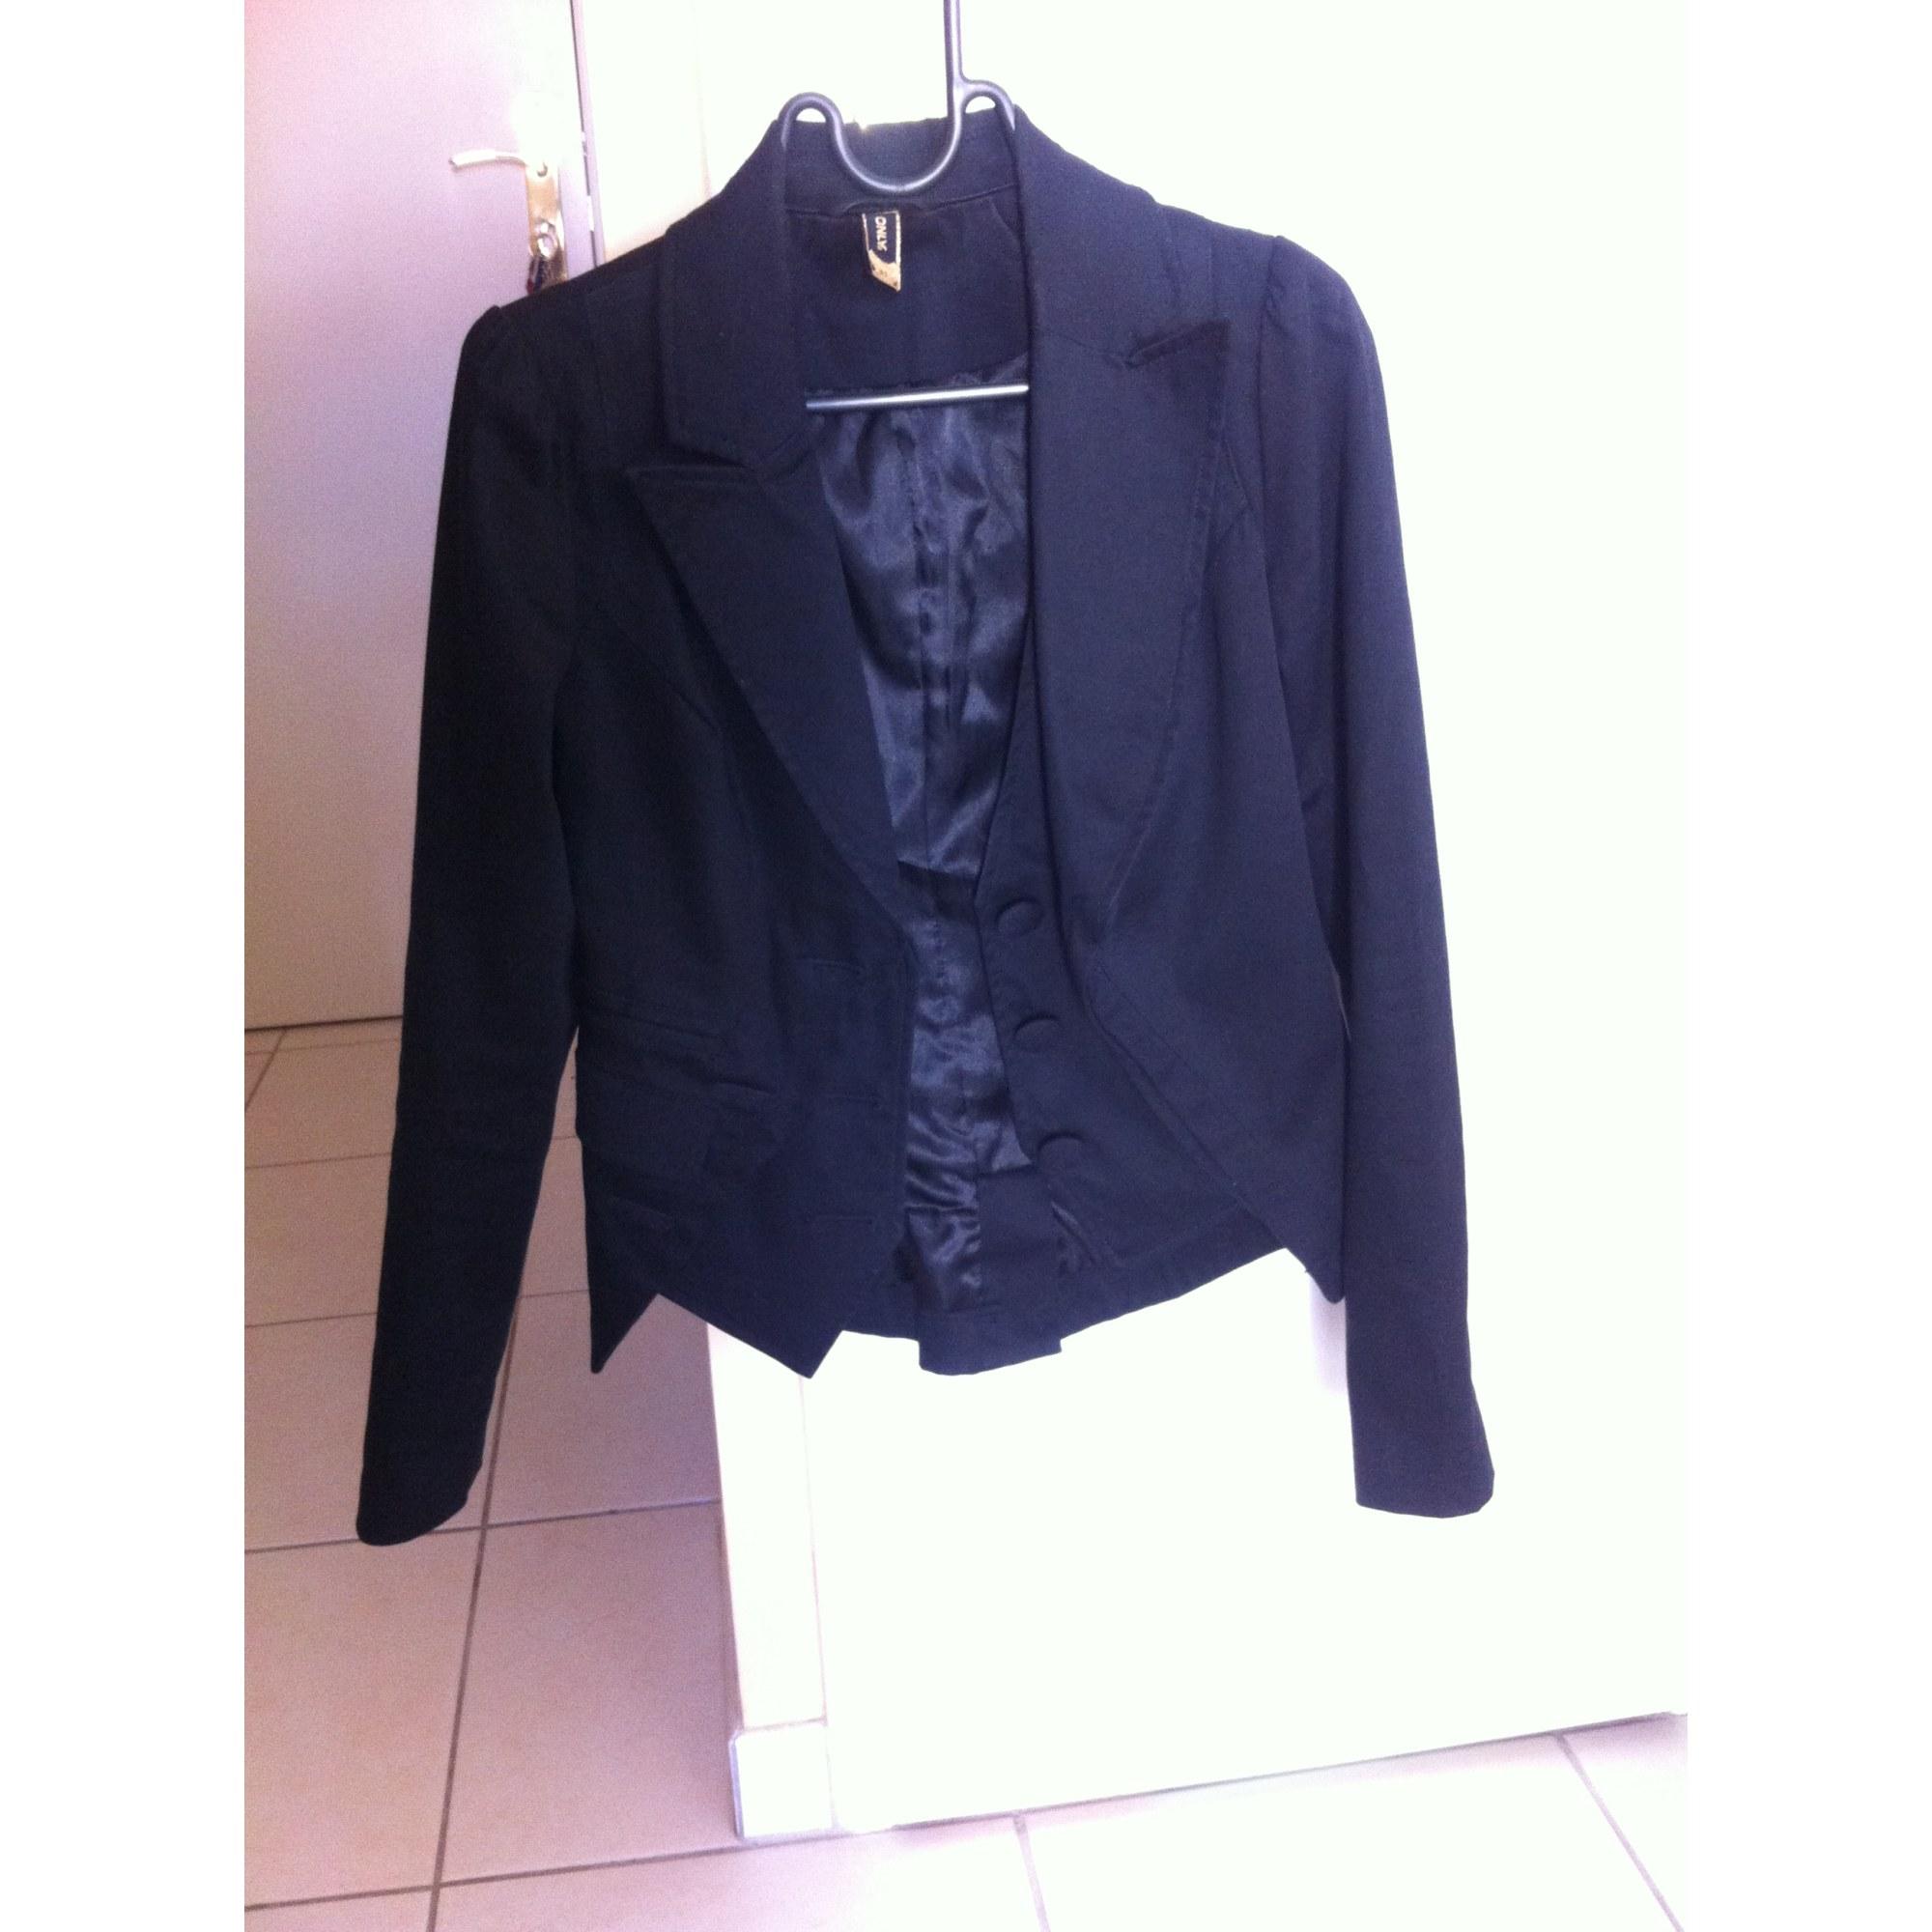 041c89b760abf Blazer, veste tailleur ONLY 34 (XS, T0) noir - 1824035